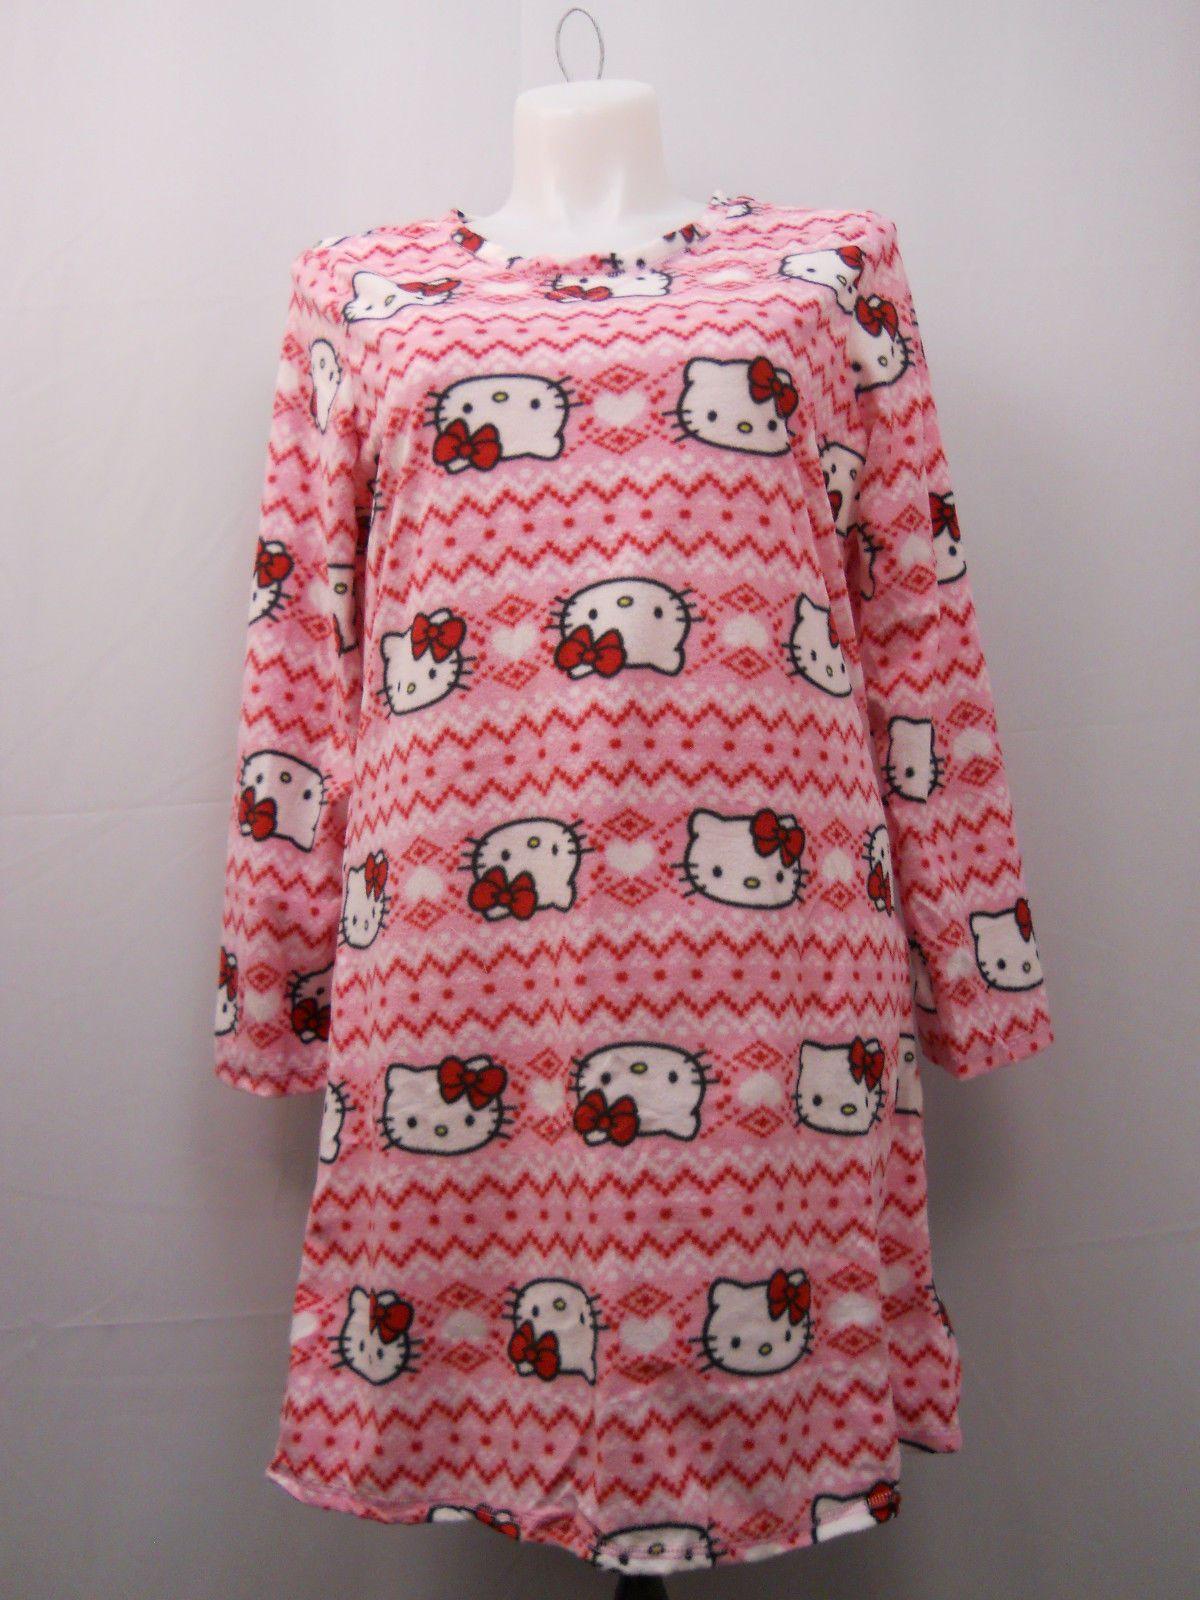 98706a83d SIZE 16-18 Womens Sleep Shirt HELLO KITTY Micro Fleece Long Sleeves  Pullover For Sale - Item #1645990